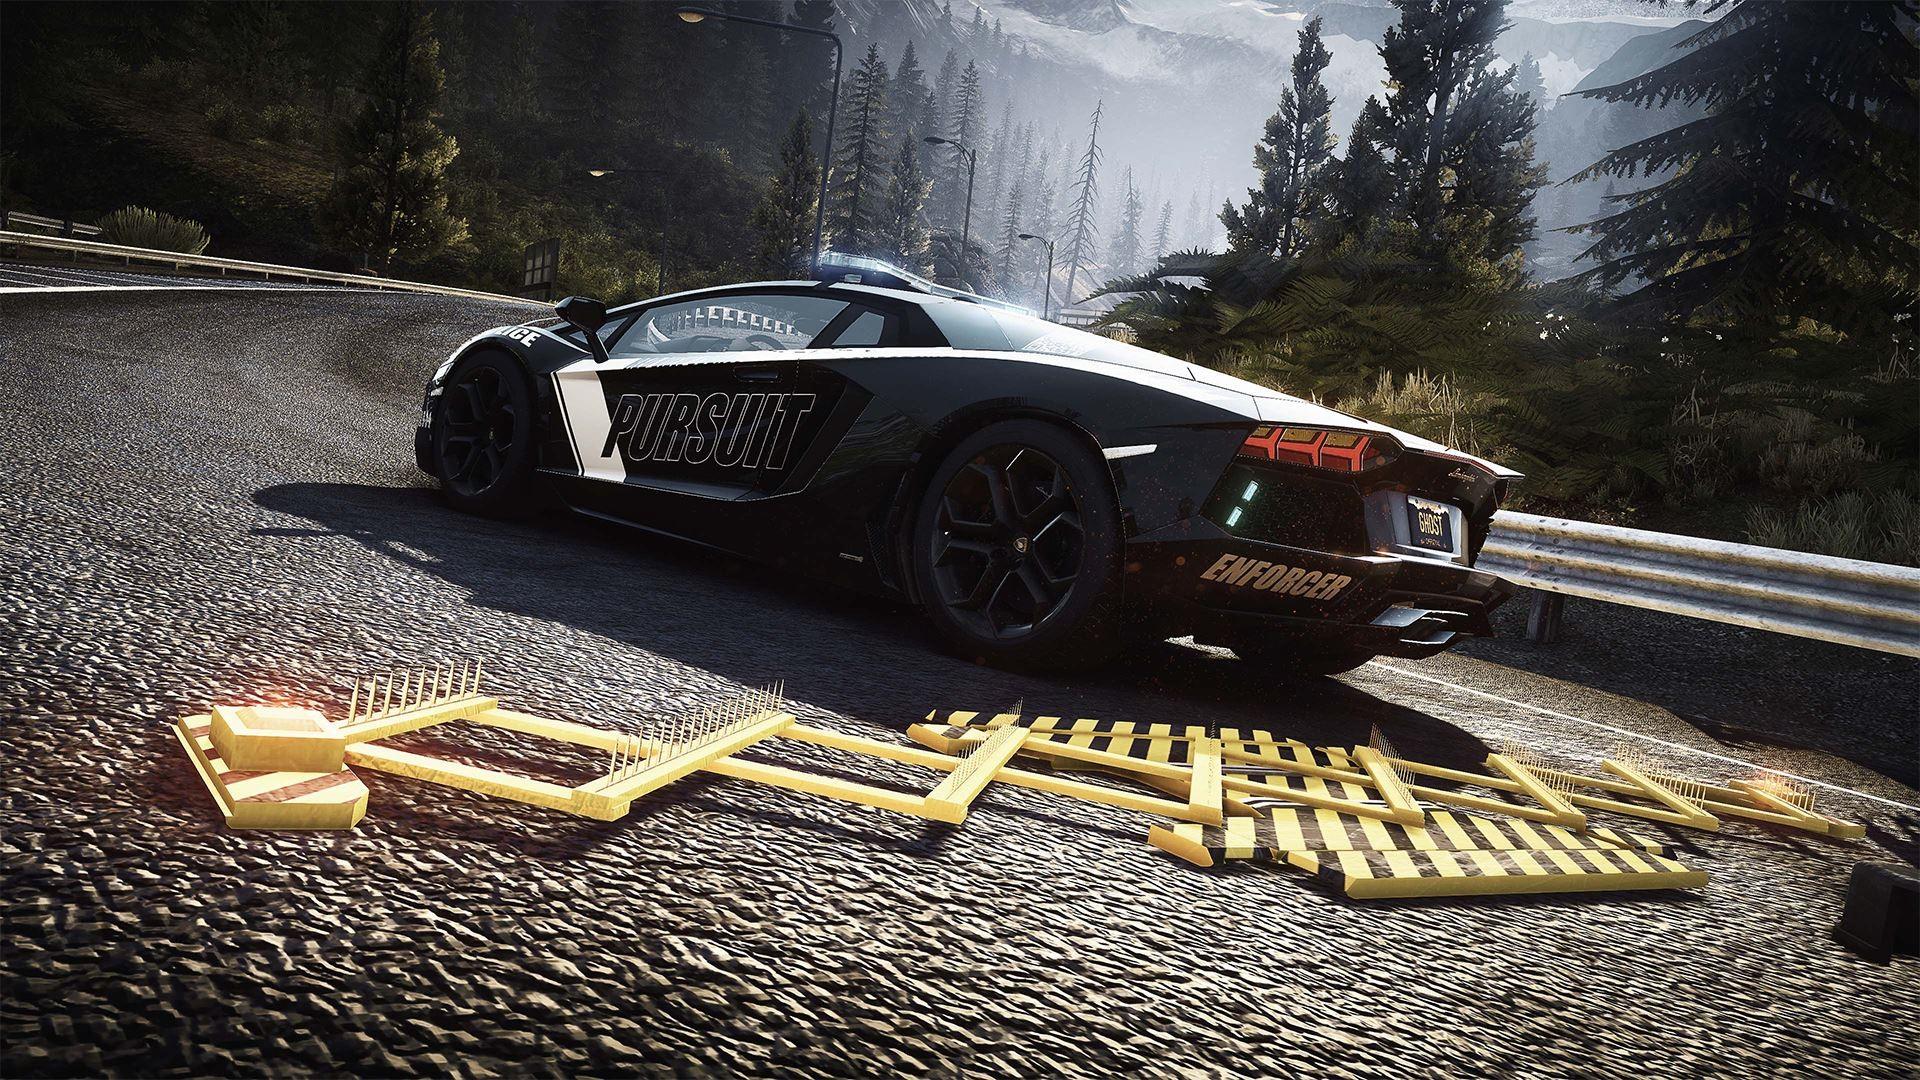 Video Games Car Vehicle Need For Speed Lamborghini Lamborghini Aventador  Audi Sports Car Audi R8 Performance